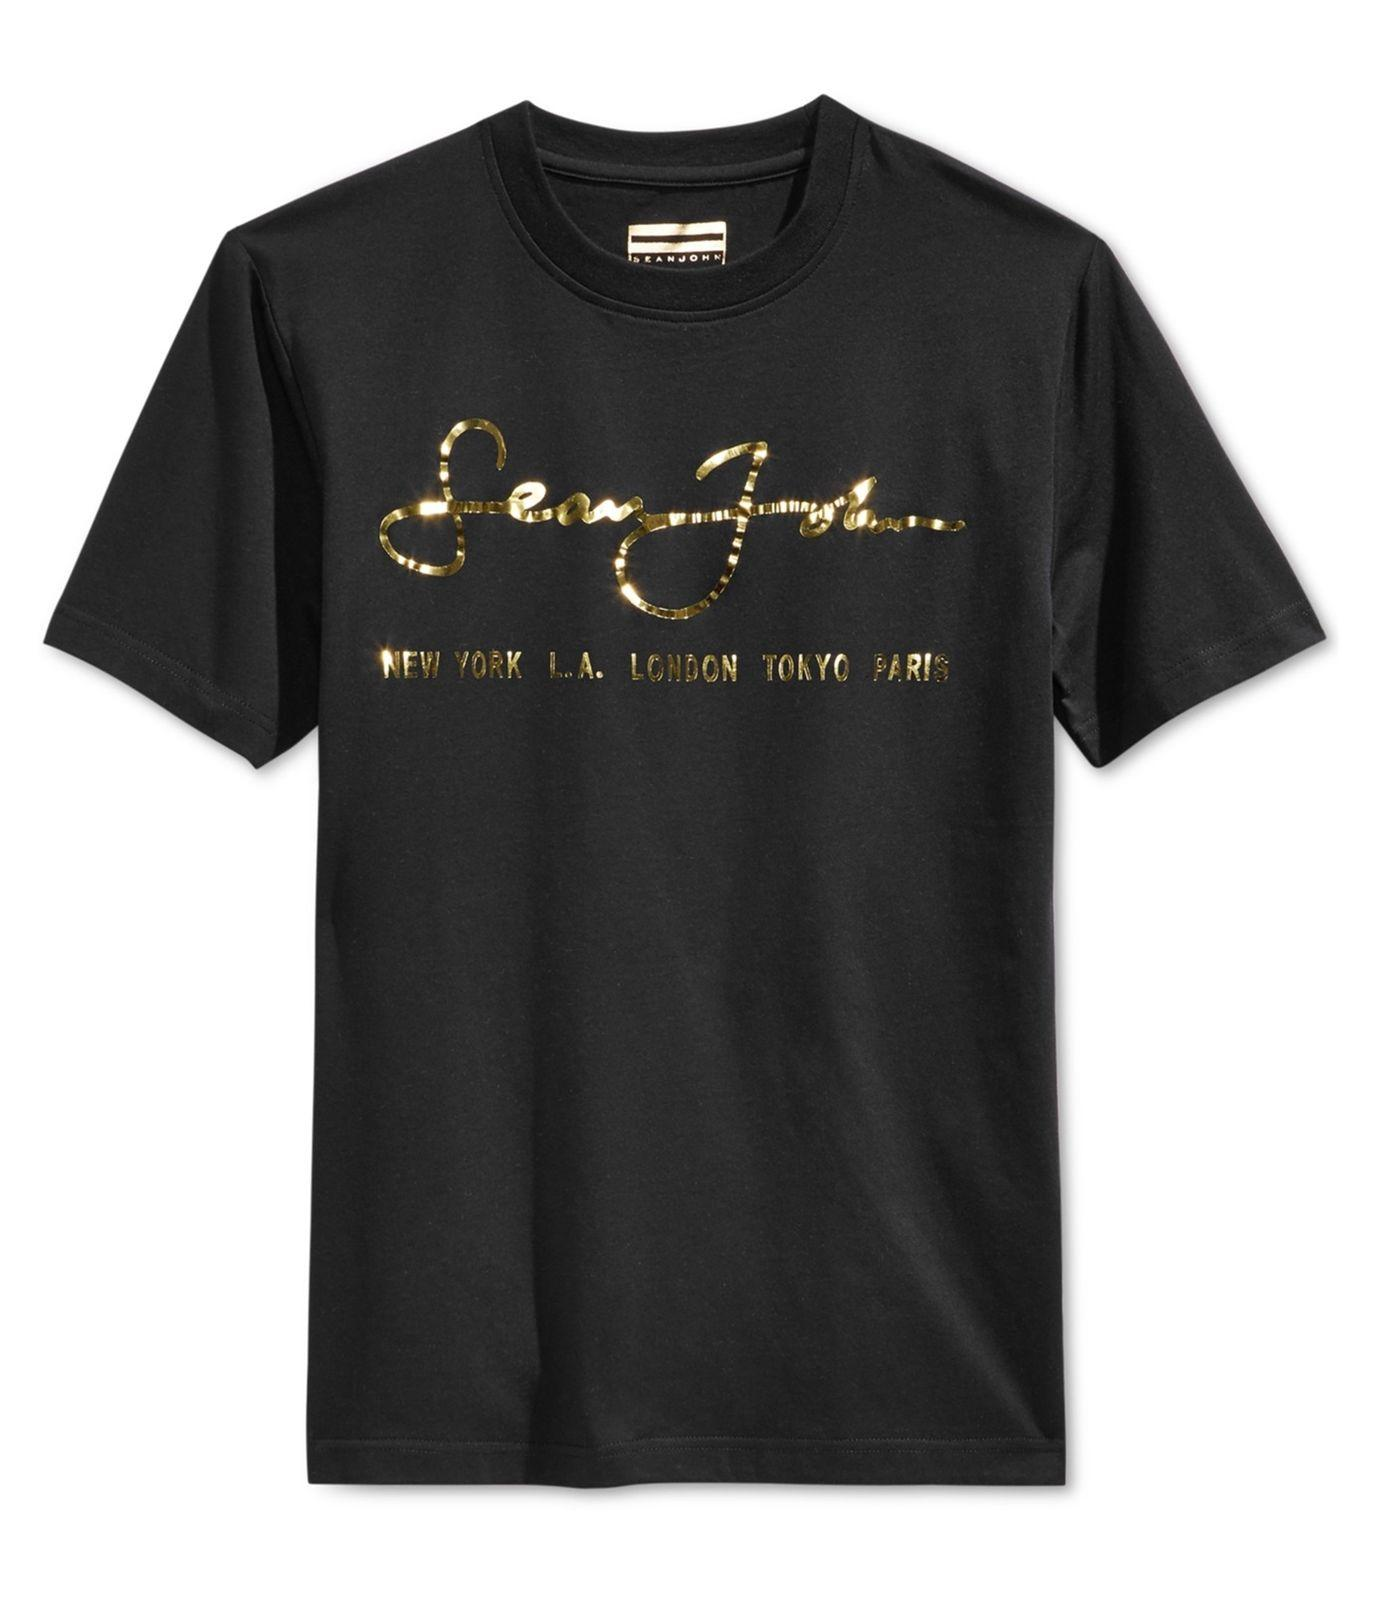 Compre Sean John Hombre Camiseta Gráfica Internacionalmente Conocida  Pmblack XL A  11.78 Del Biyue5  f141d3699c91e